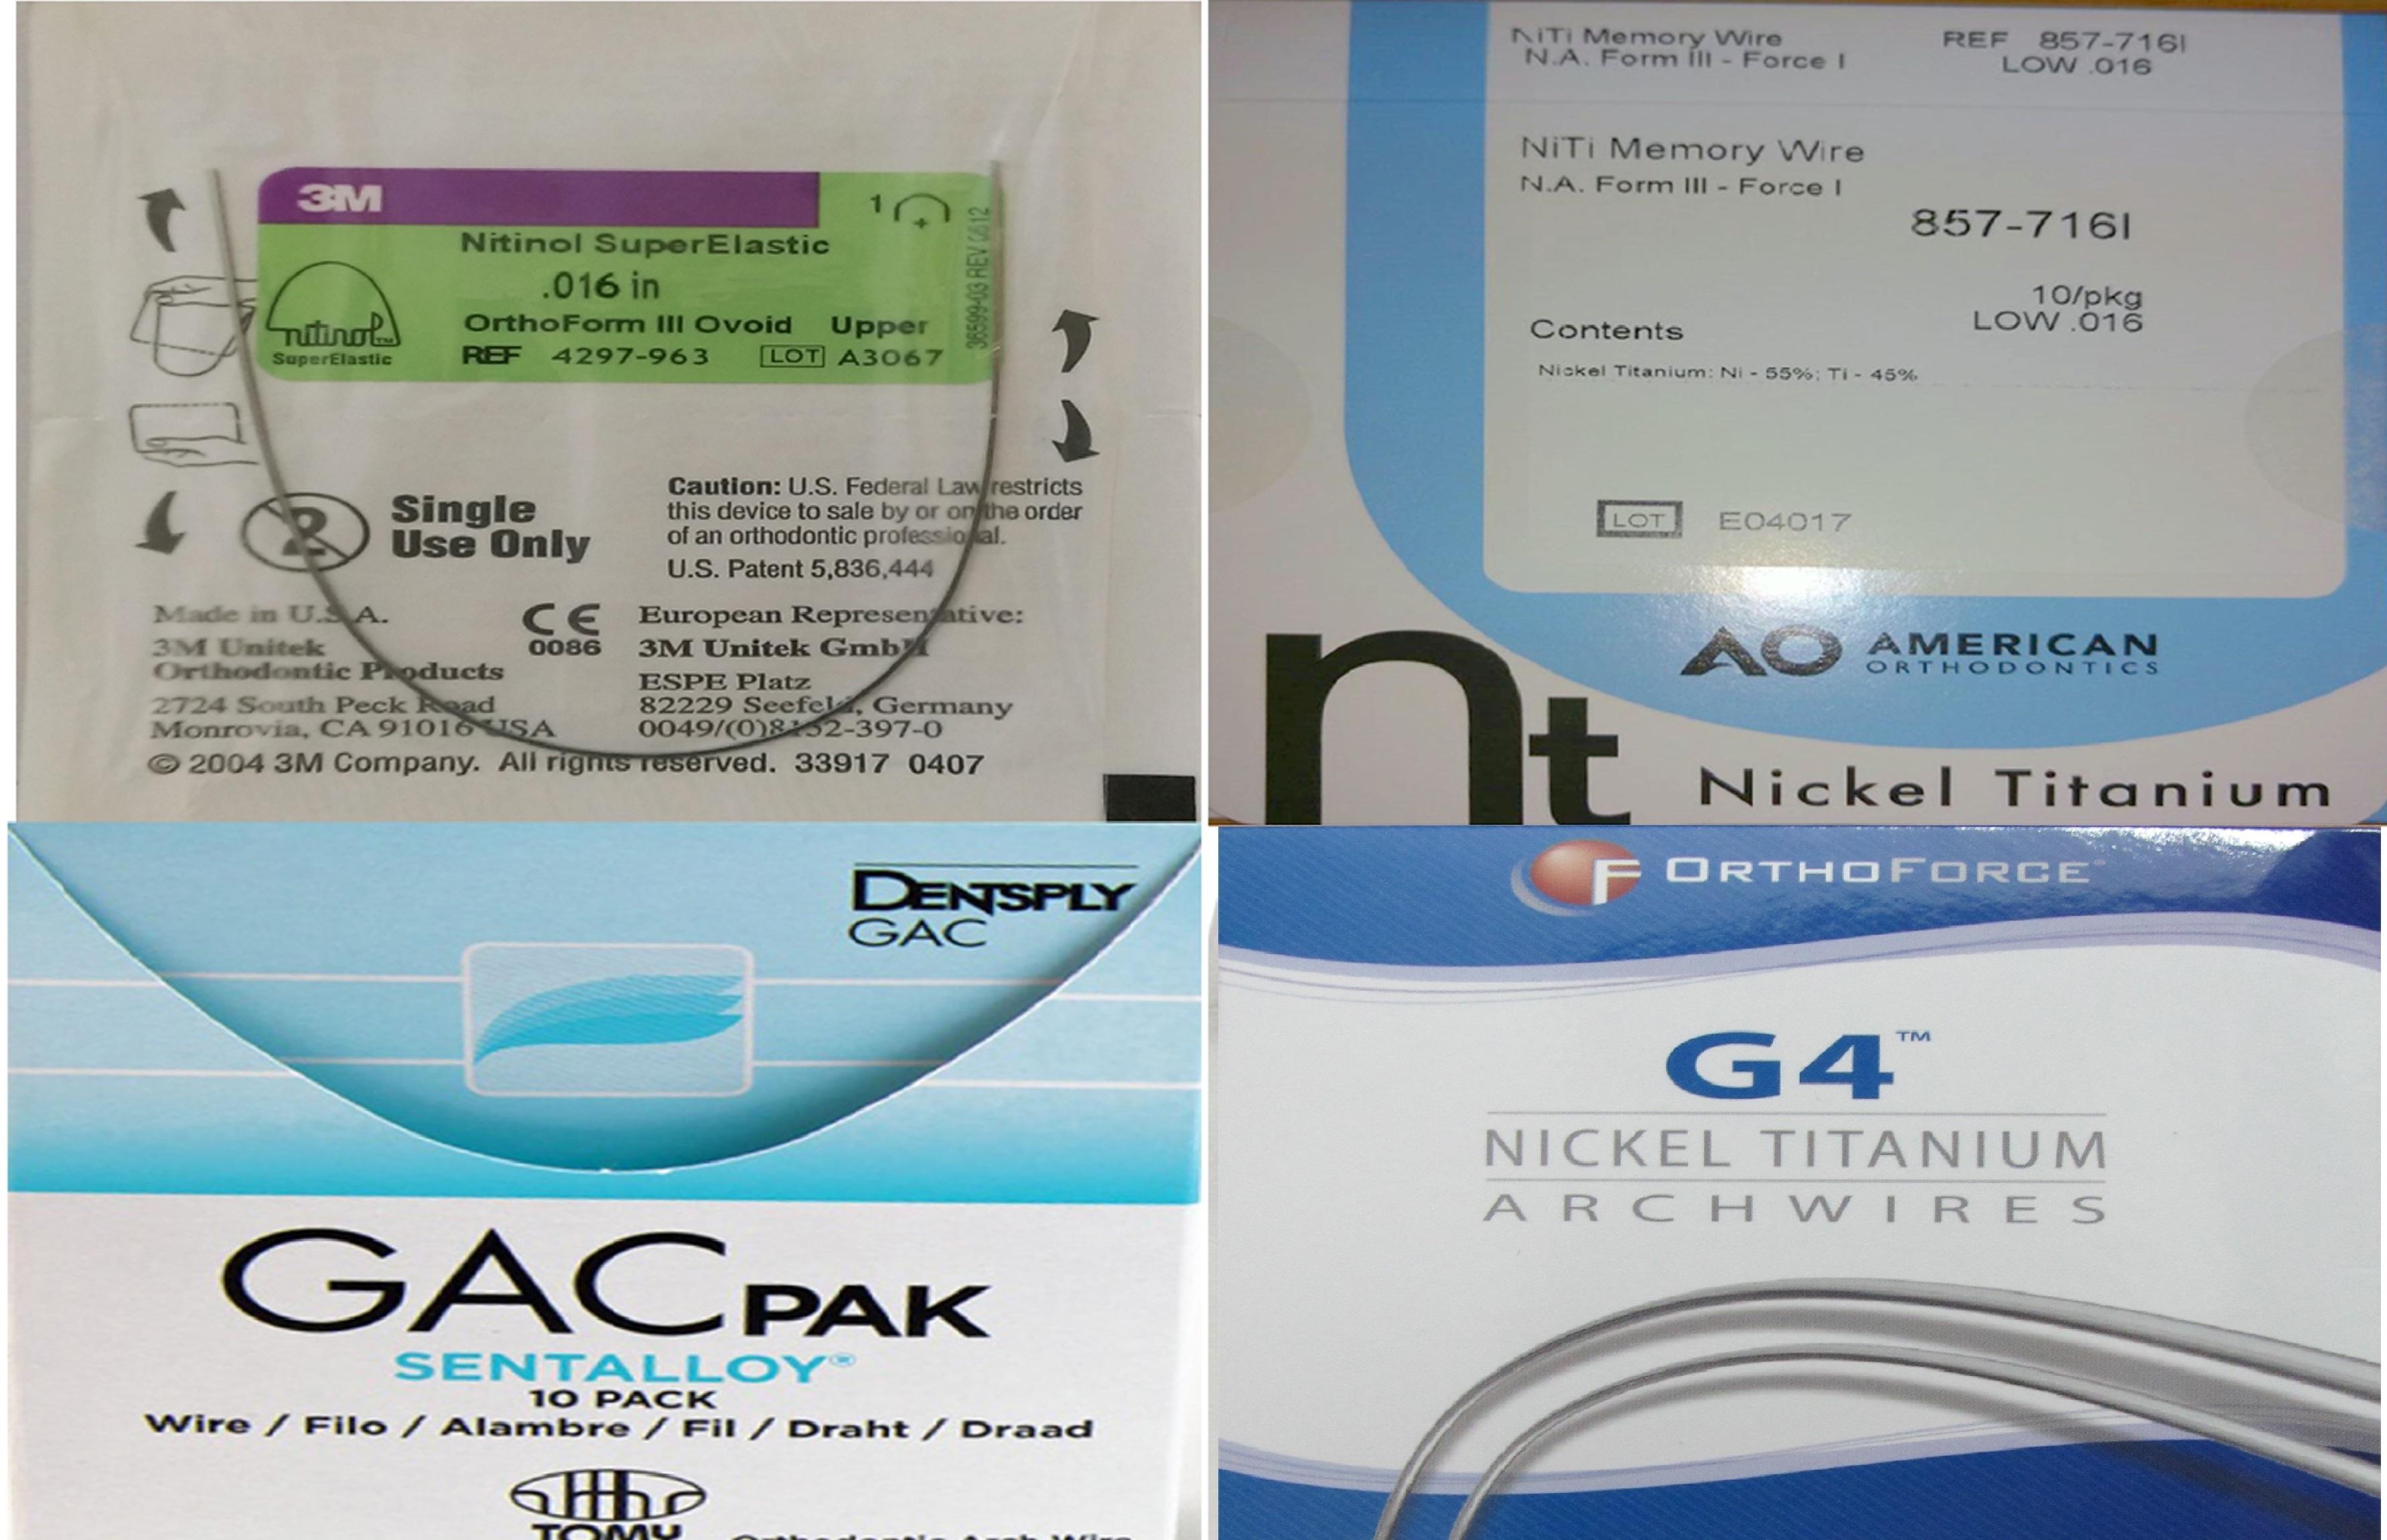 JCDR - Nitinol, Orthodontics, Sterilization